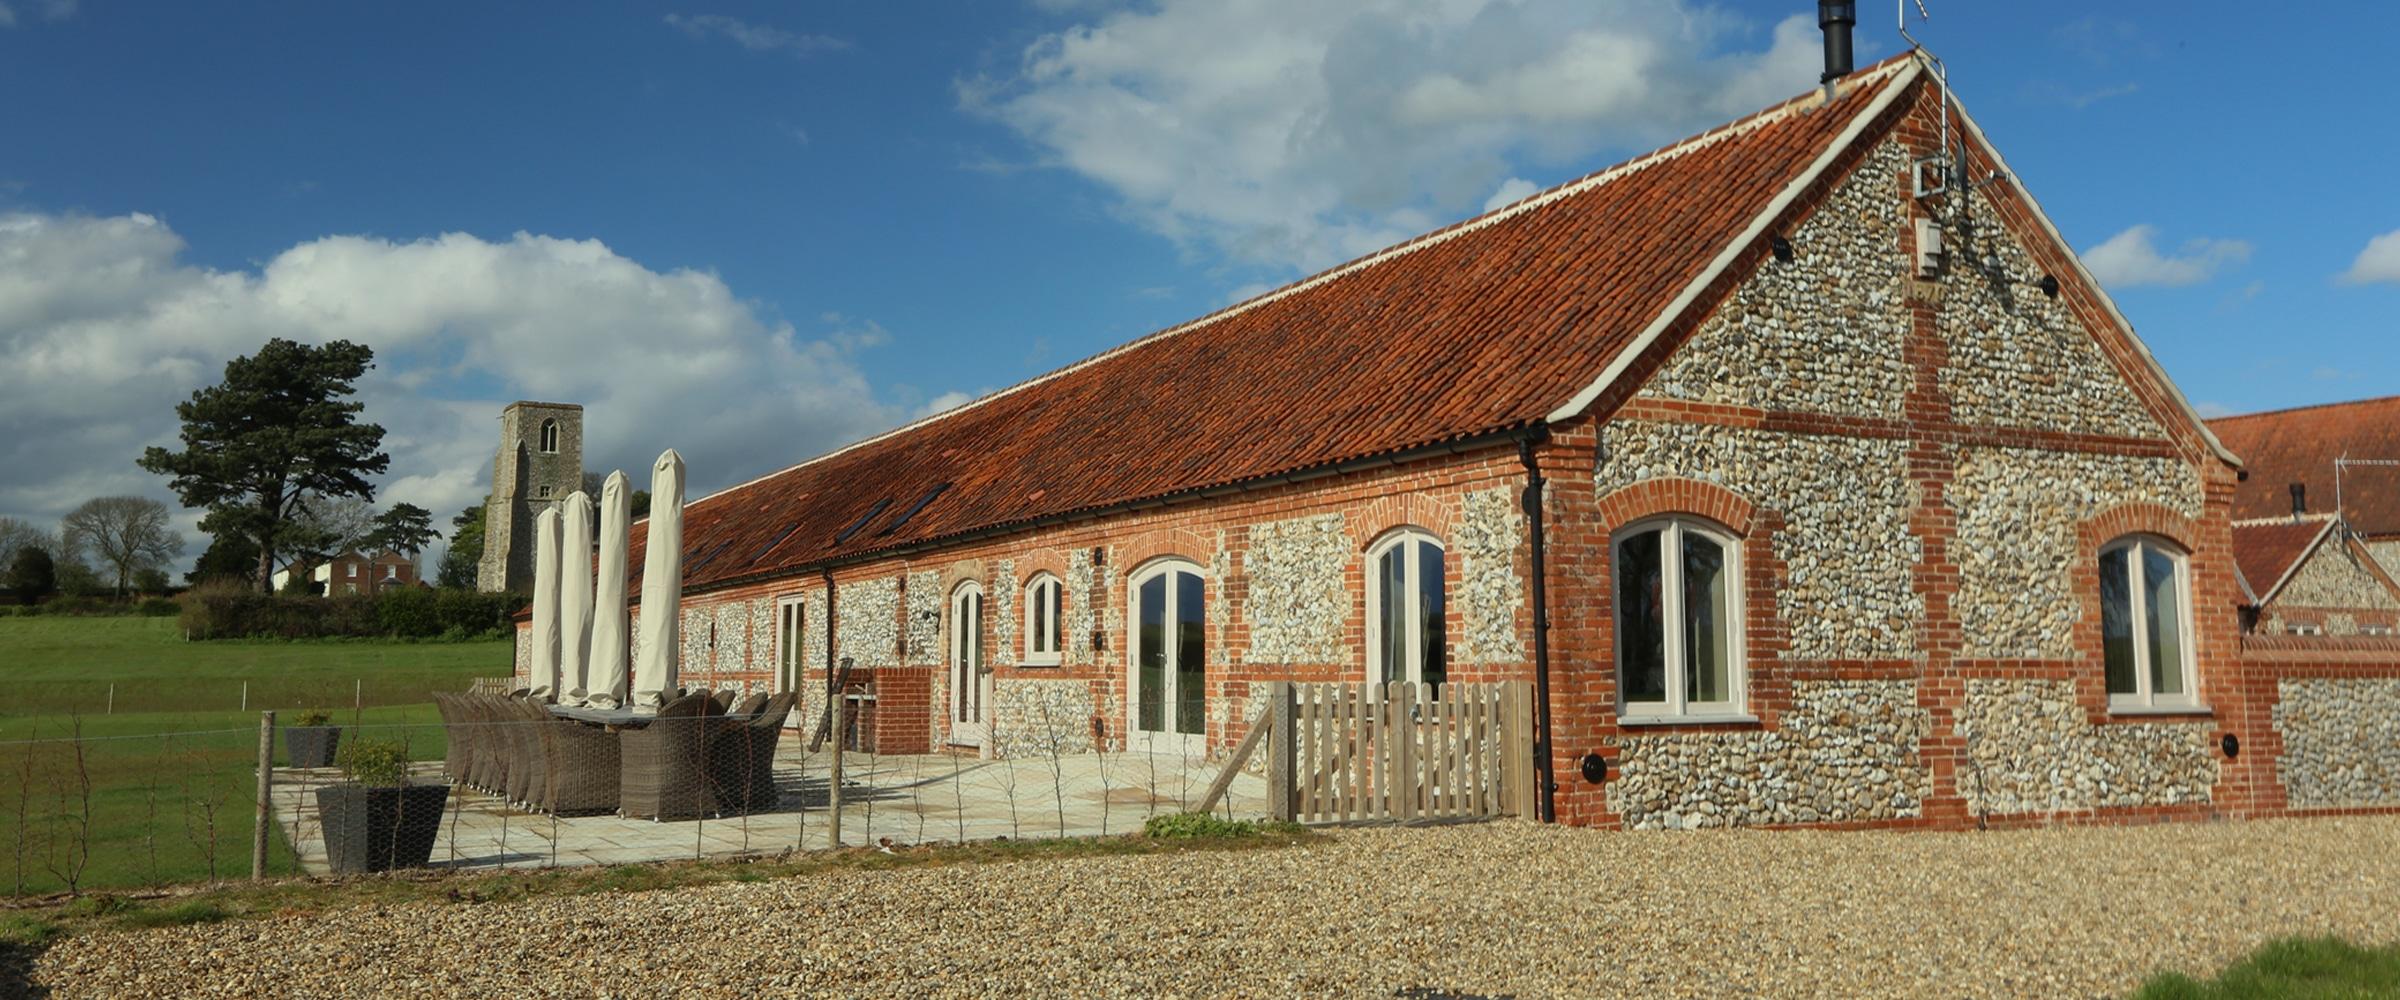 Brazenhall Barns - Side wall - Slider image